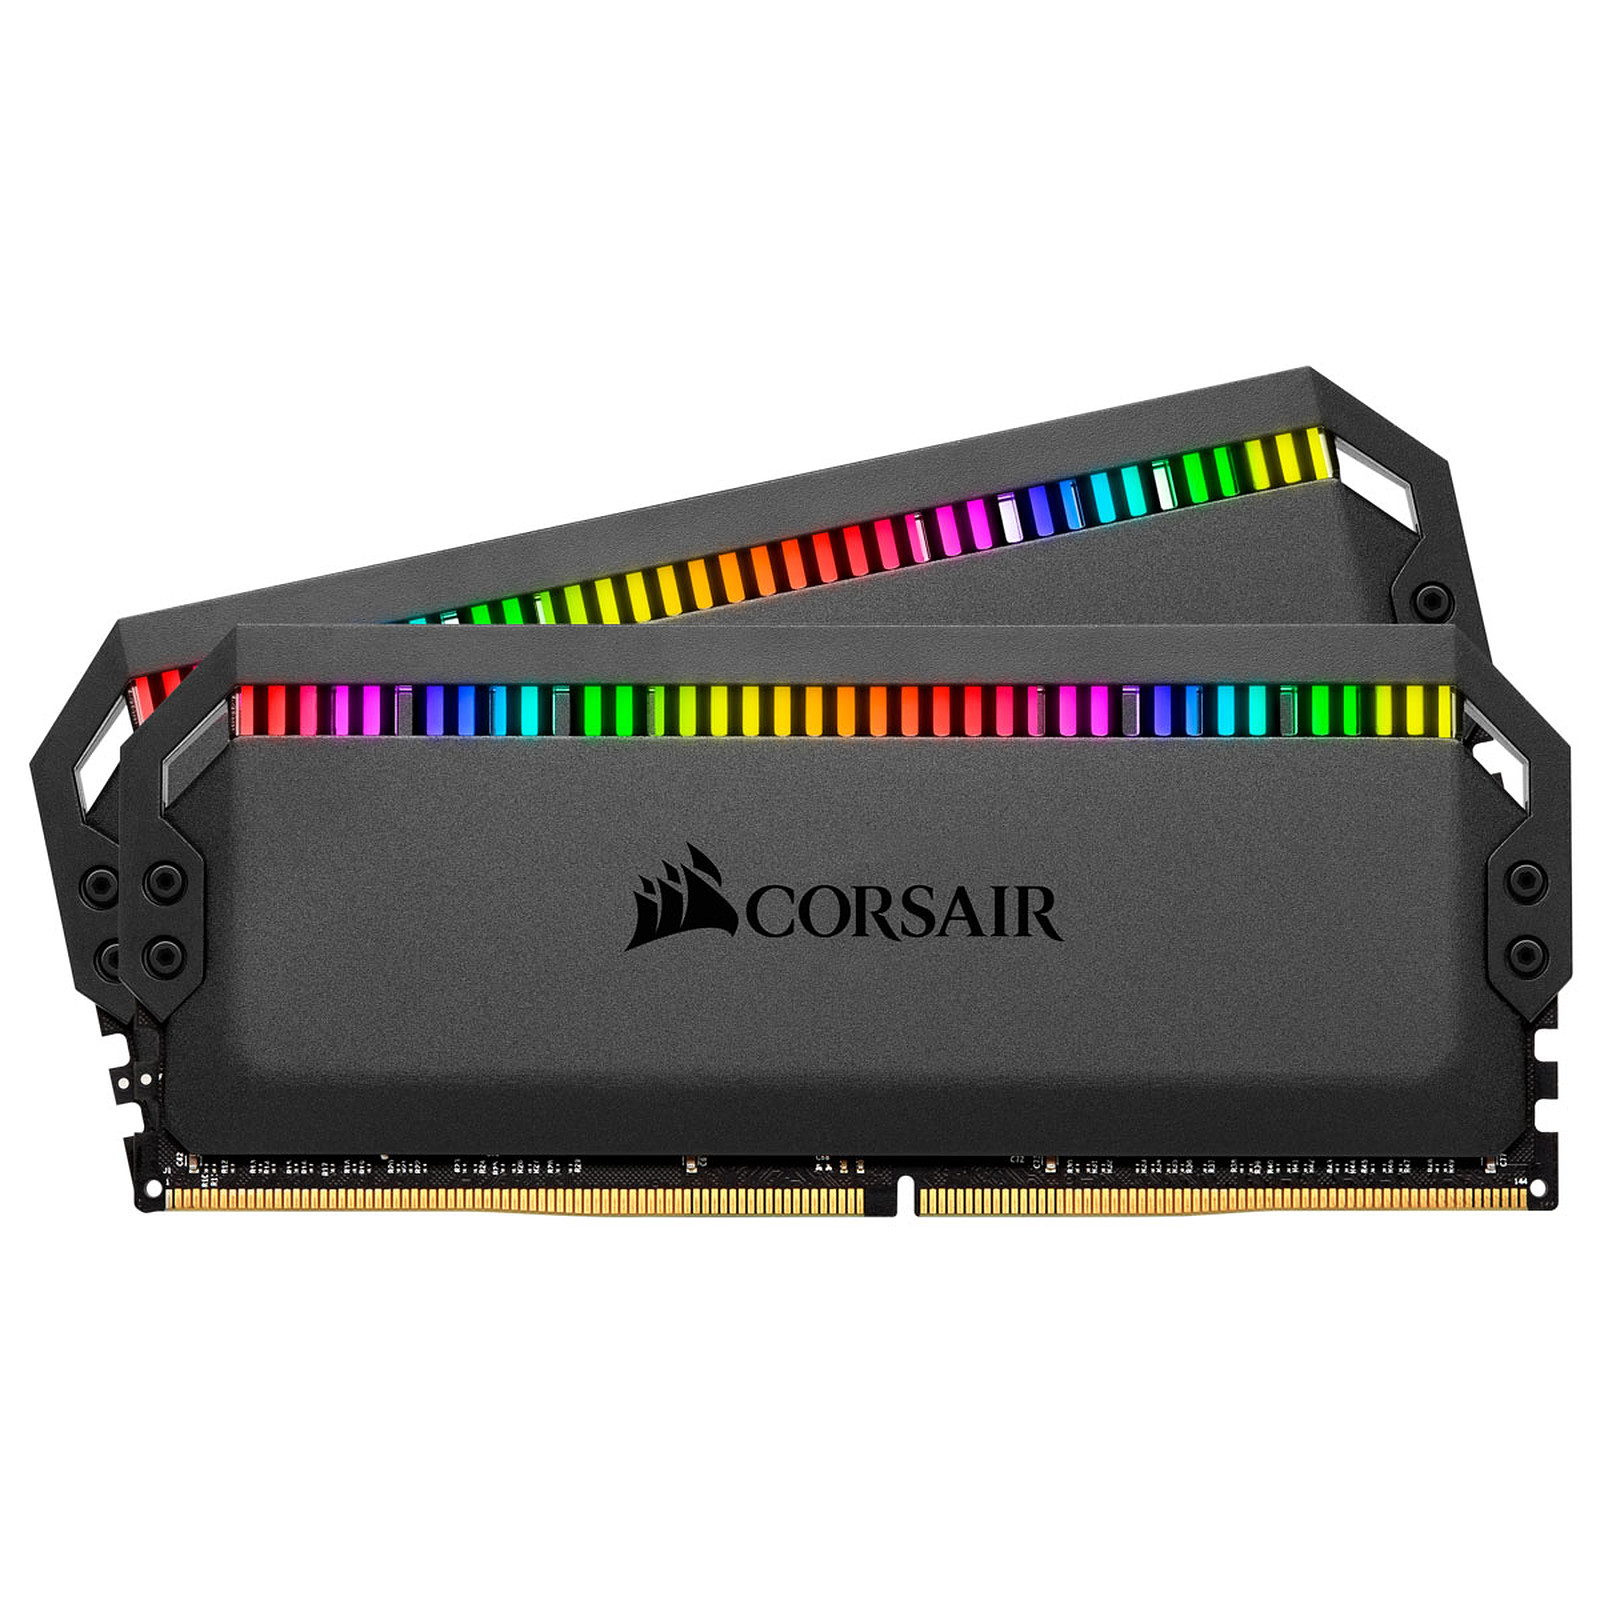 Corsair Dominator Platinum RGB 32 Go (2x 16 Go) DDR4 4000 MHz CL19